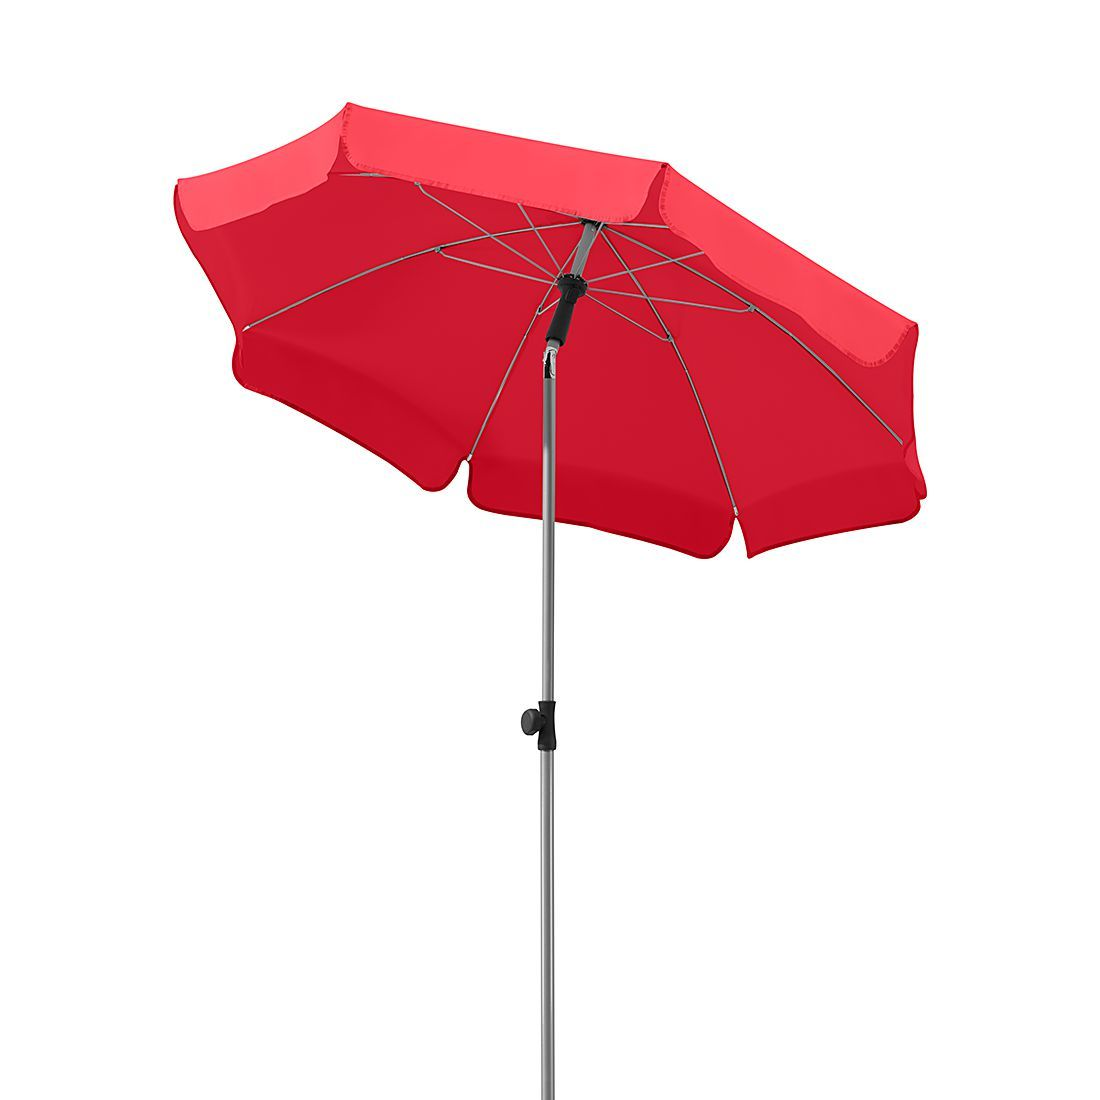 Parasol Micco I - staal/polyester - zilverkeurig/rood, Schneider Schirme